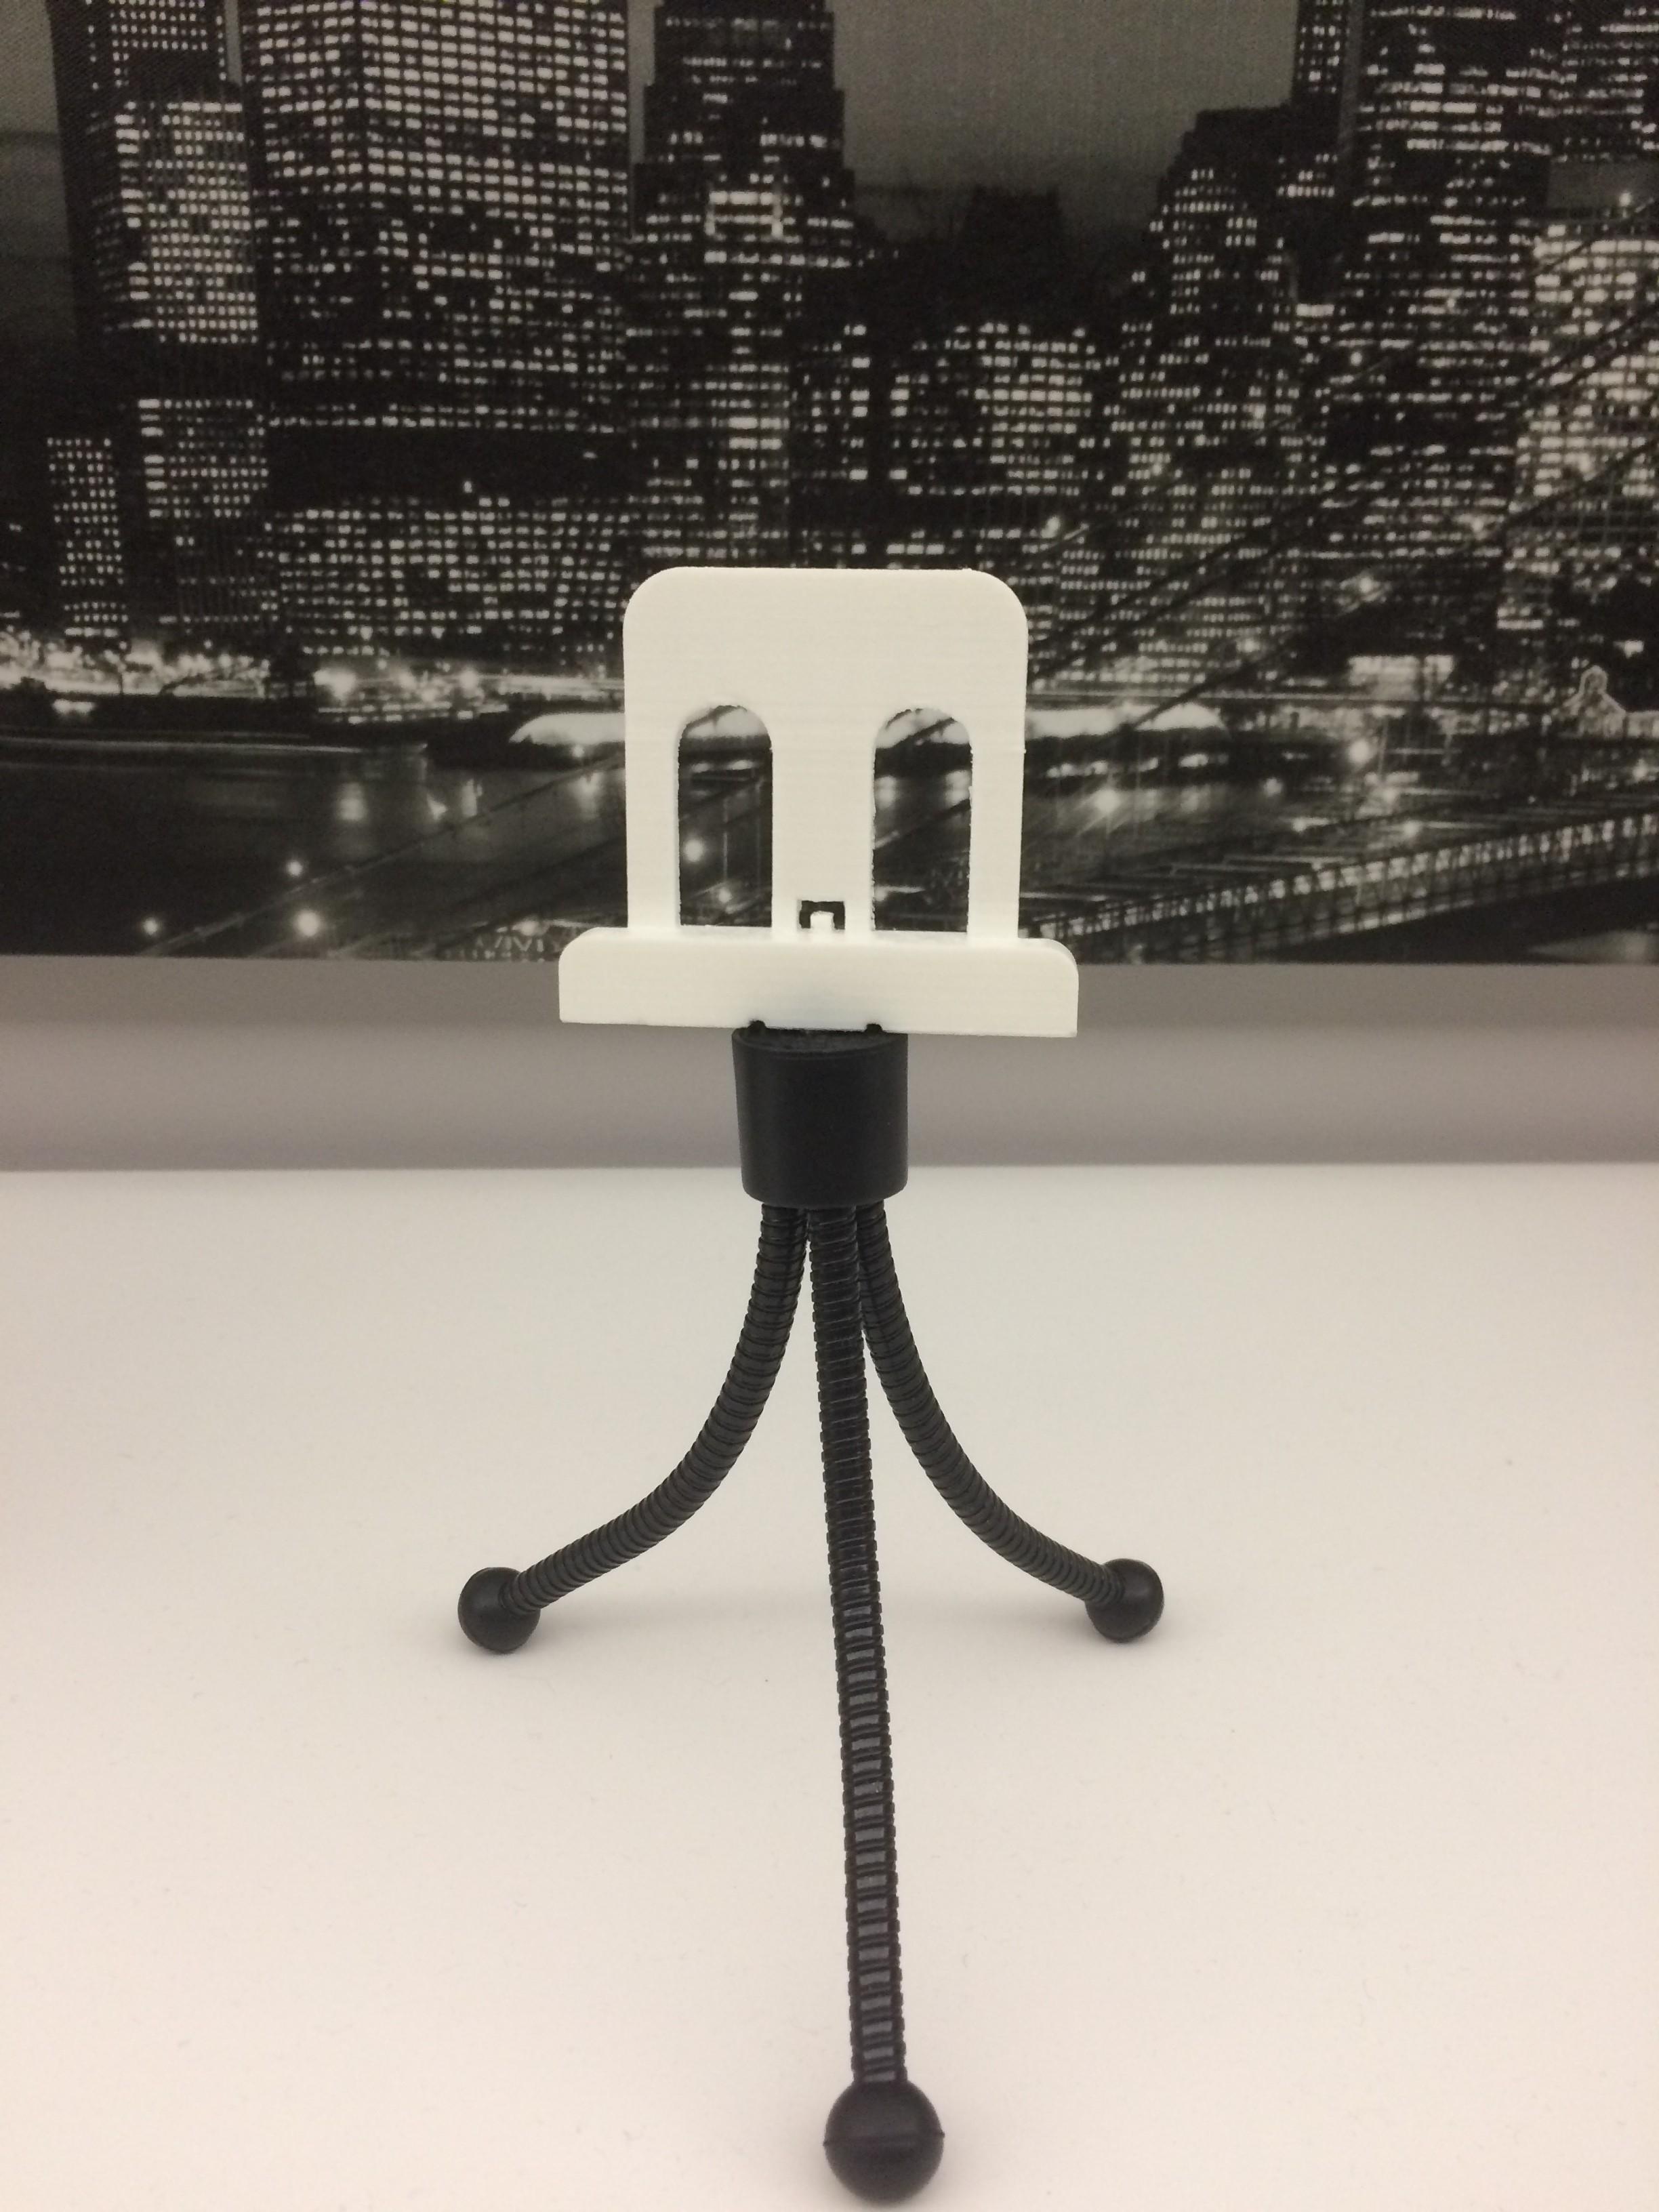 IMG_4742.JPG Download free STL file Telephone holder for tripods • 3D printer design, arth